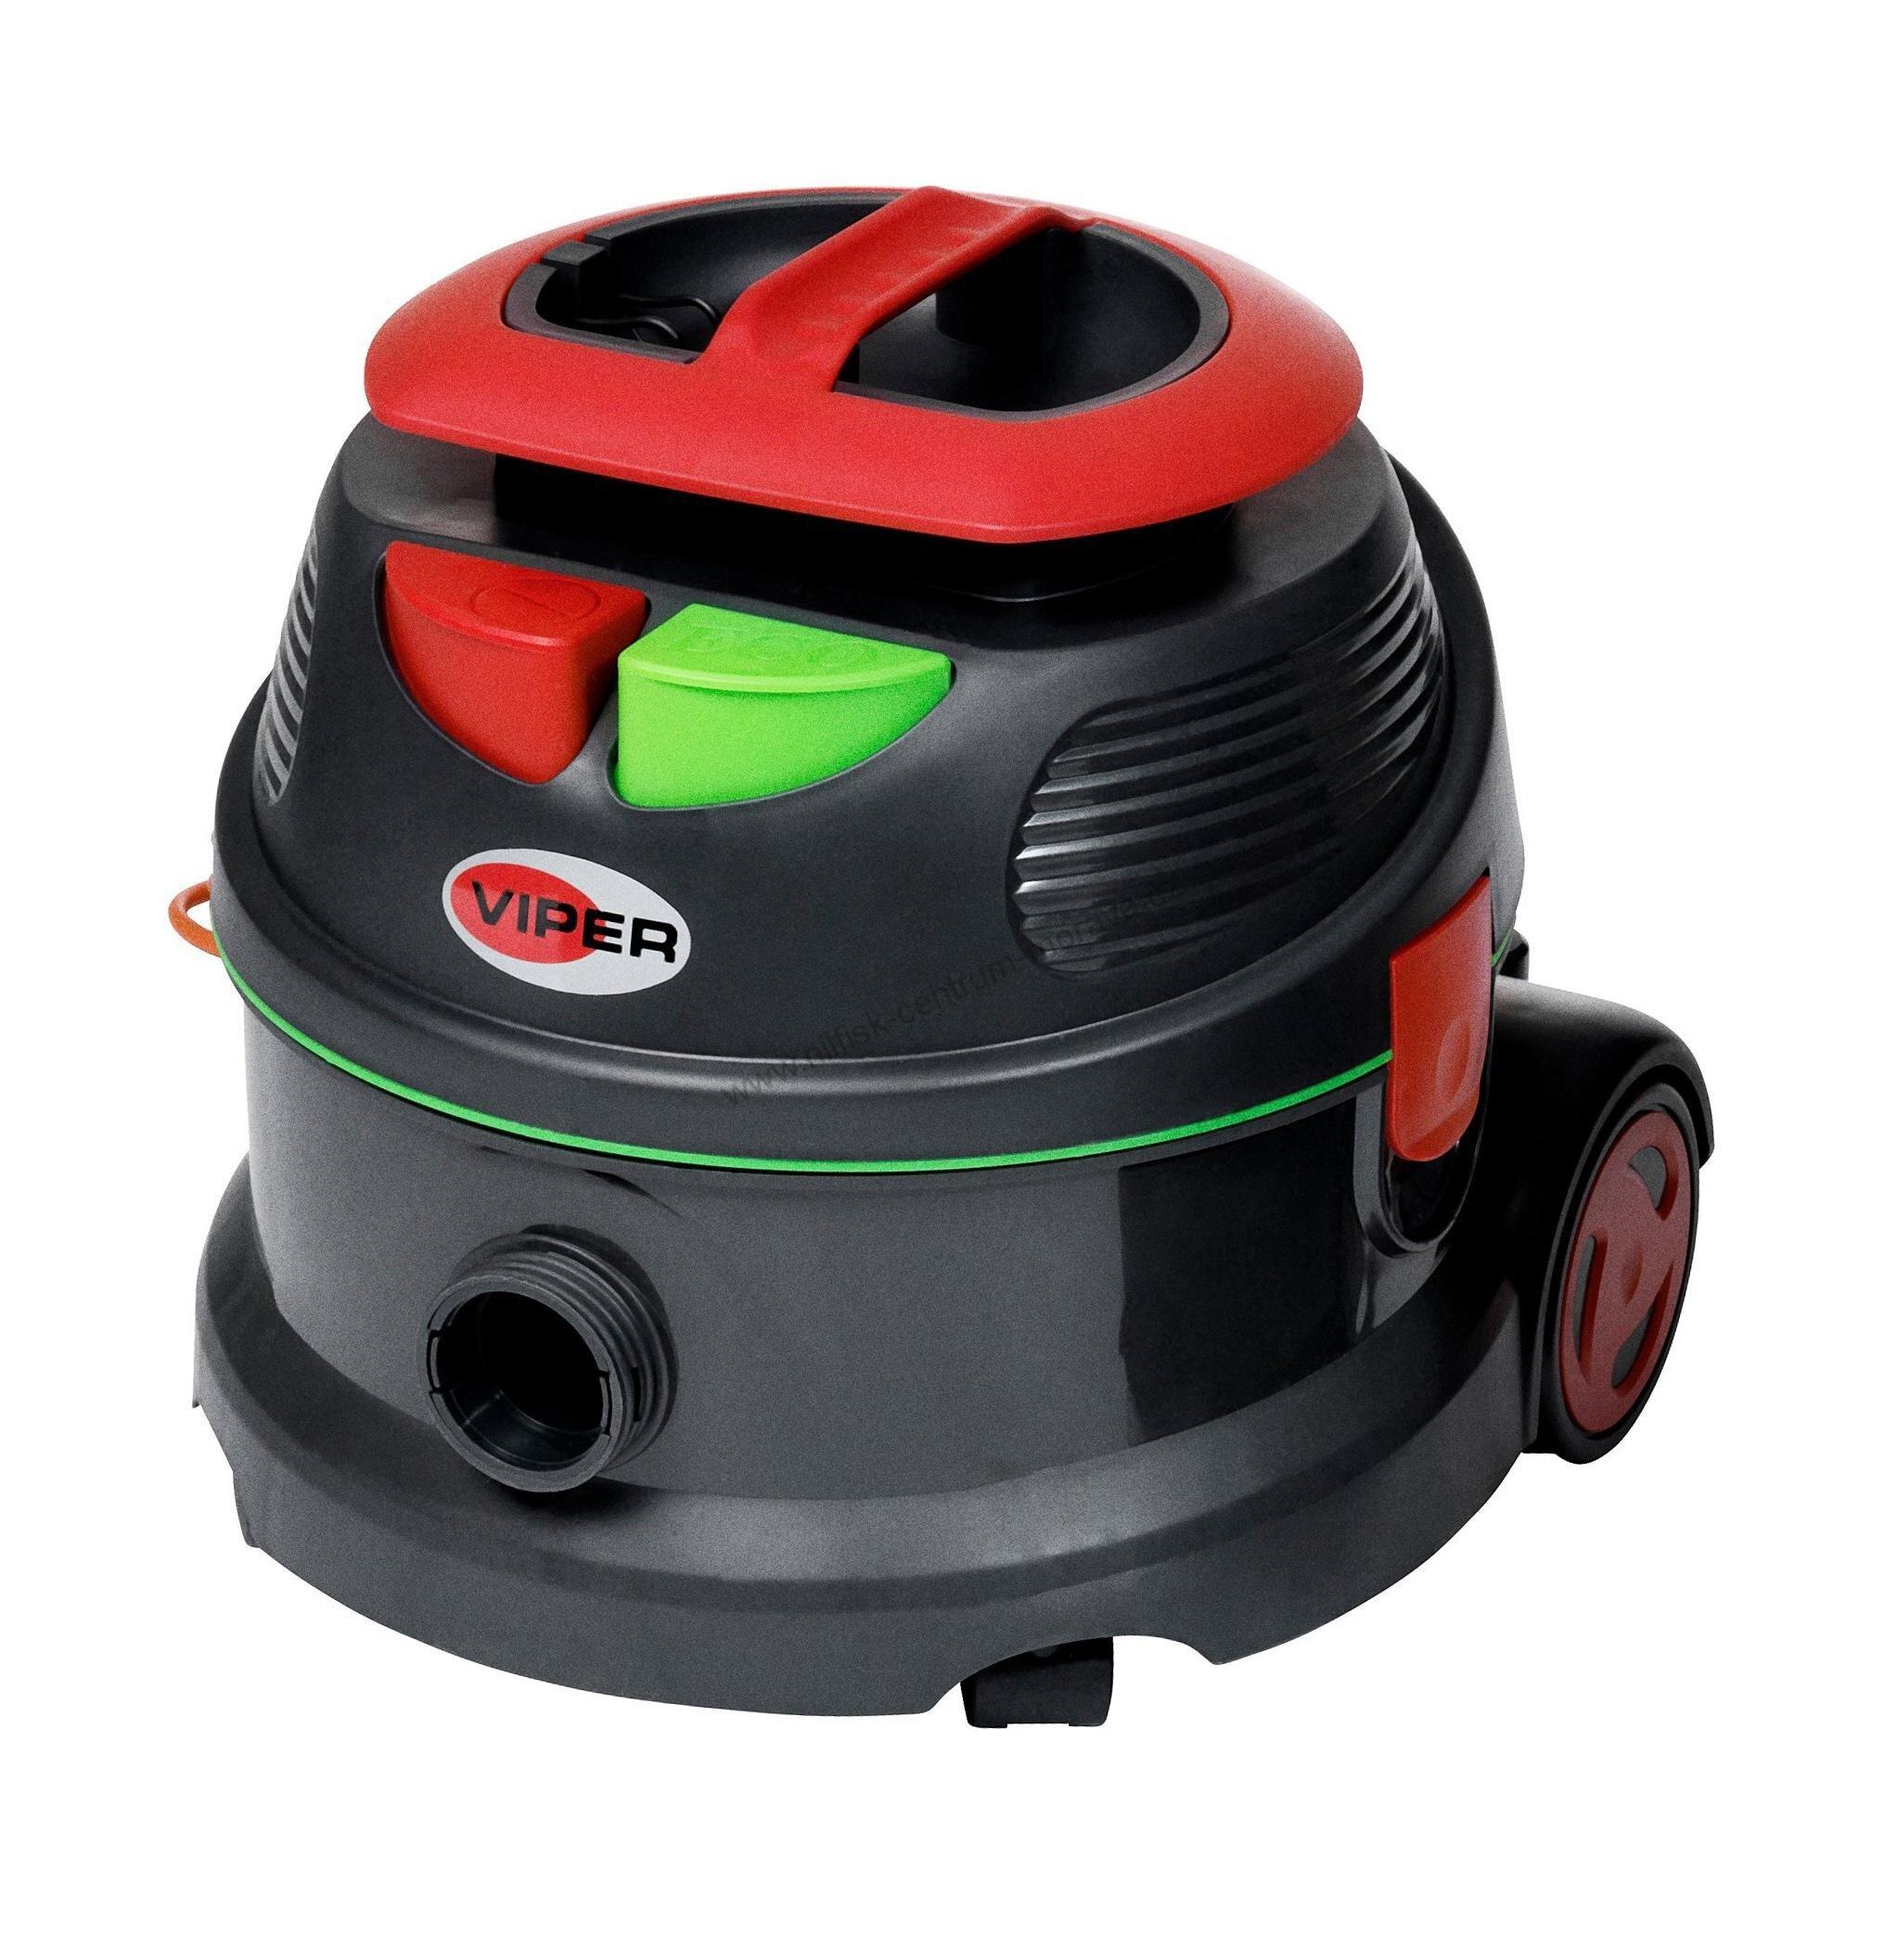 Viper DSU12 Commercial Vacumm Cleaner - Hepa filter